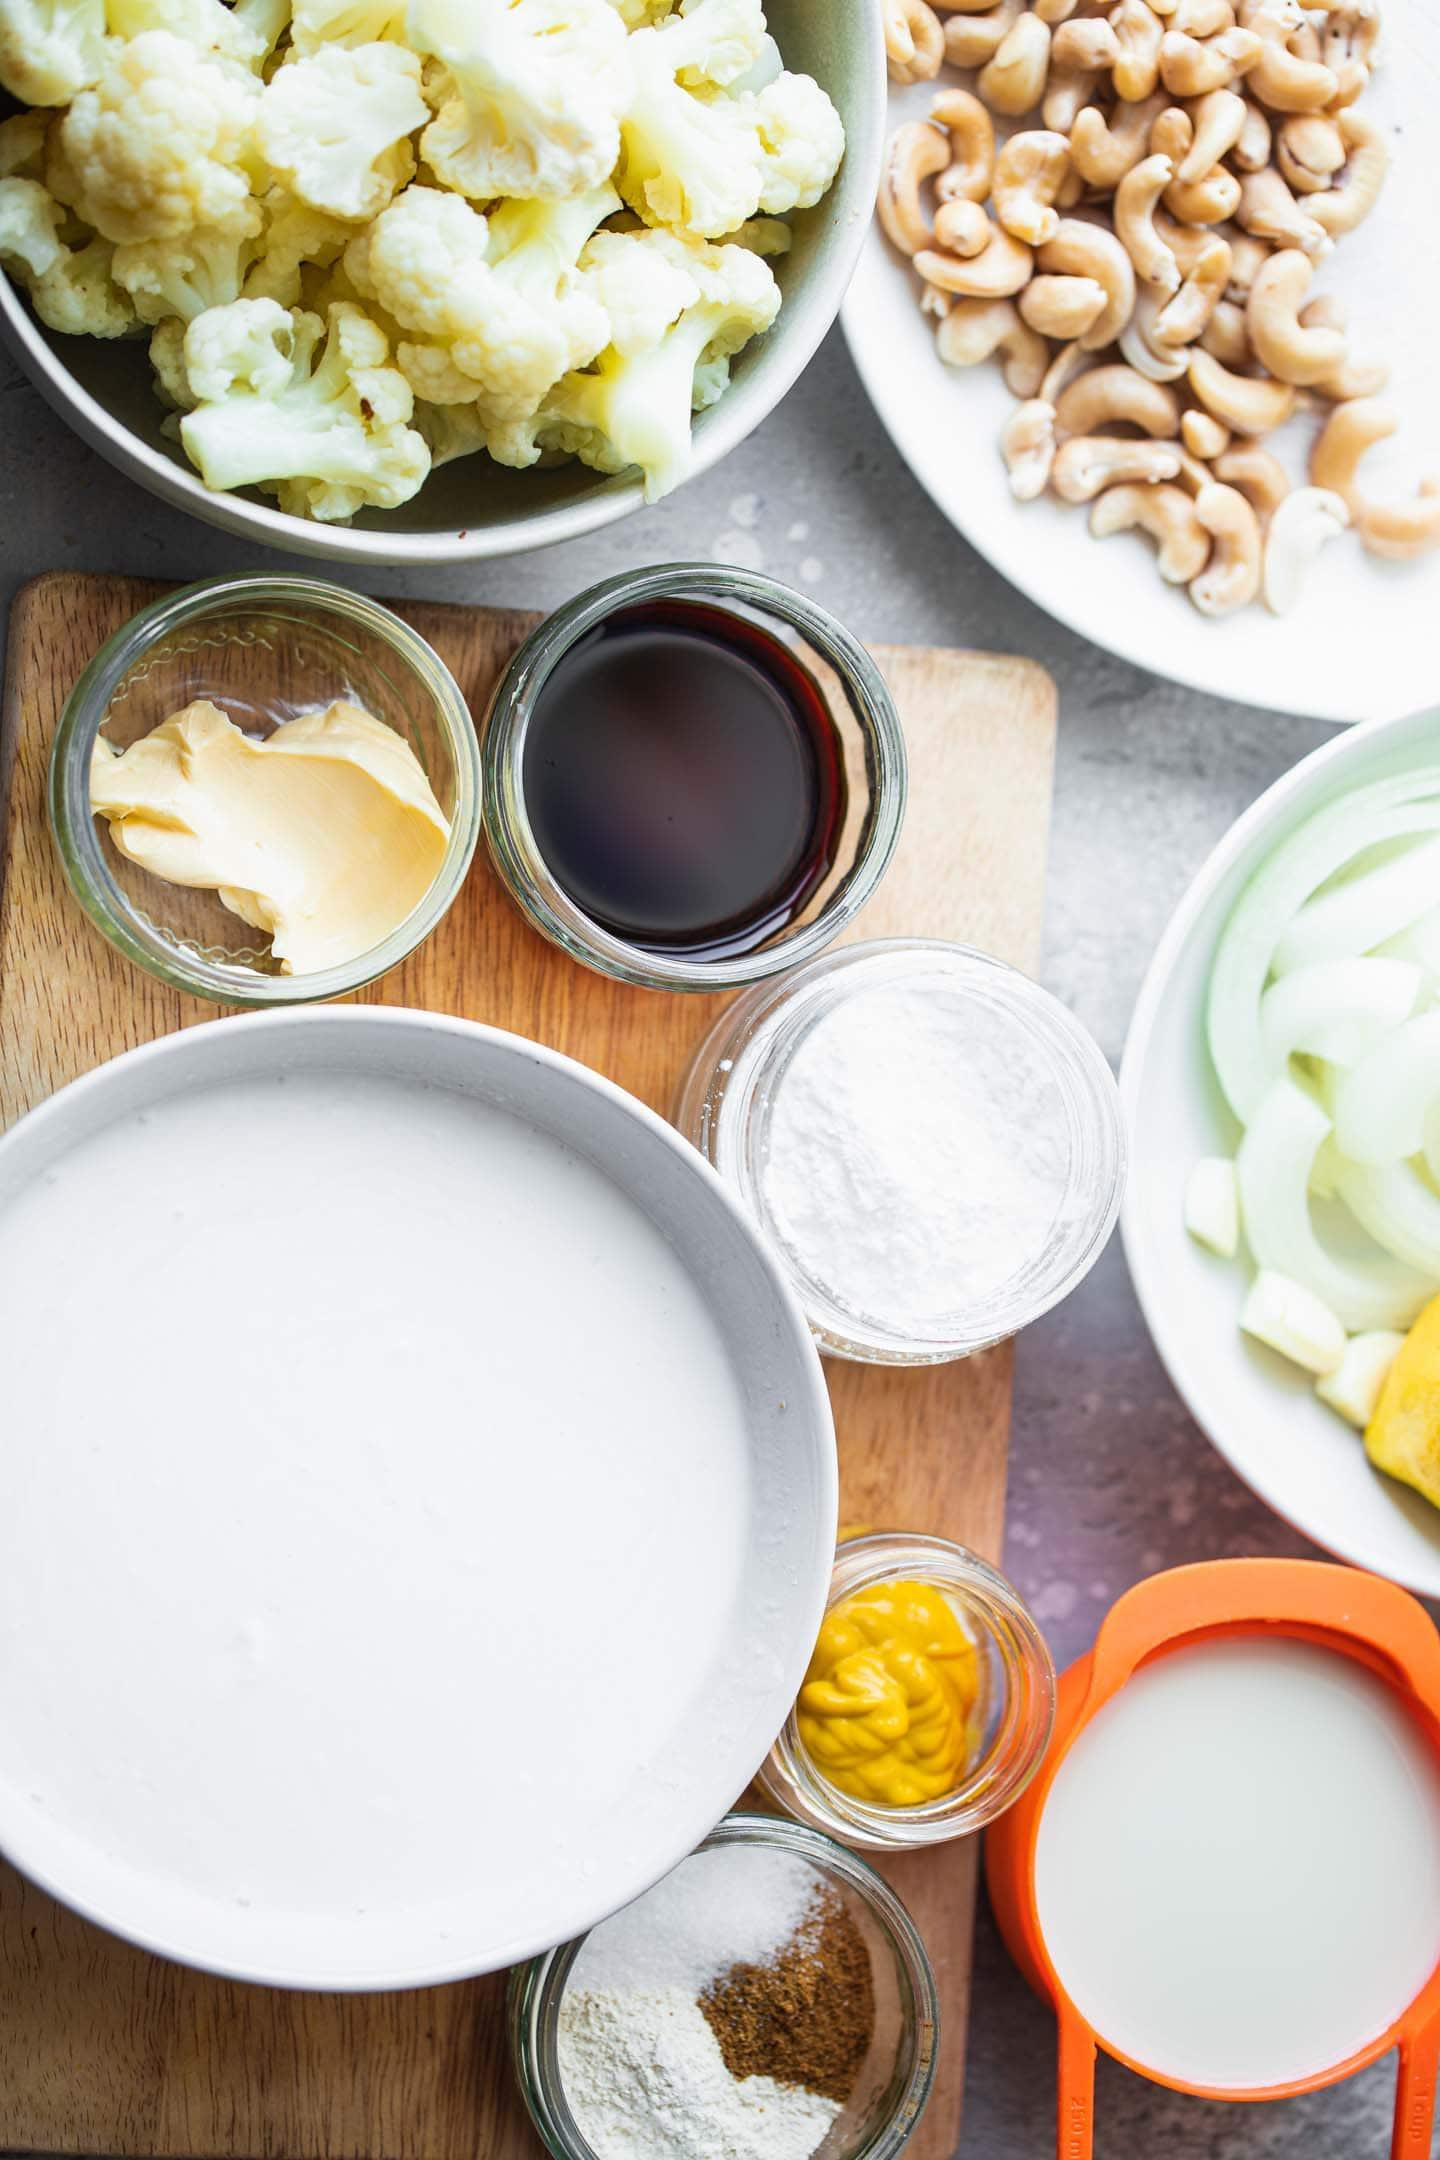 Ingredients for vegan cauliflower cheese